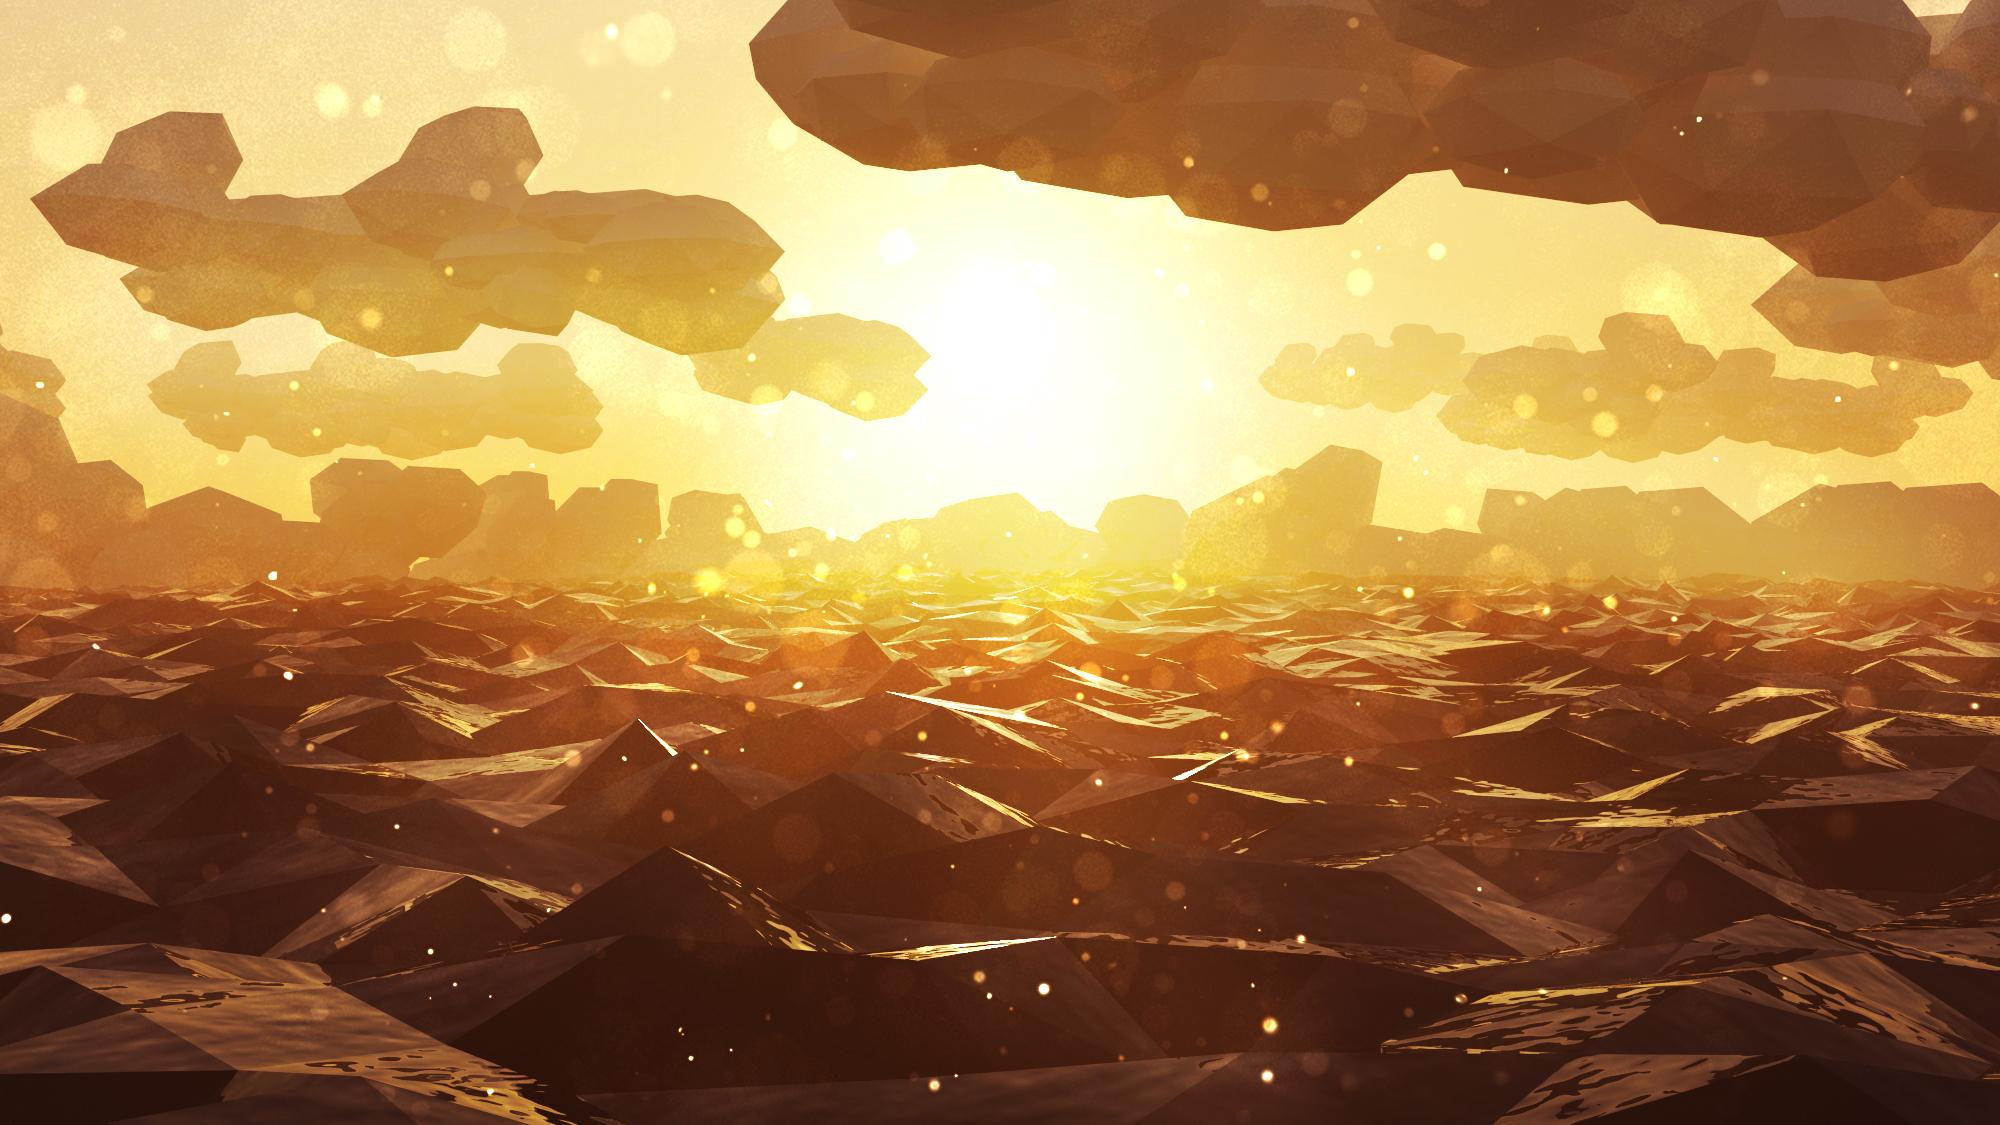 Low Poly Sunset wallpaper low polygon art 3D graphics landscape sea 2000x1125